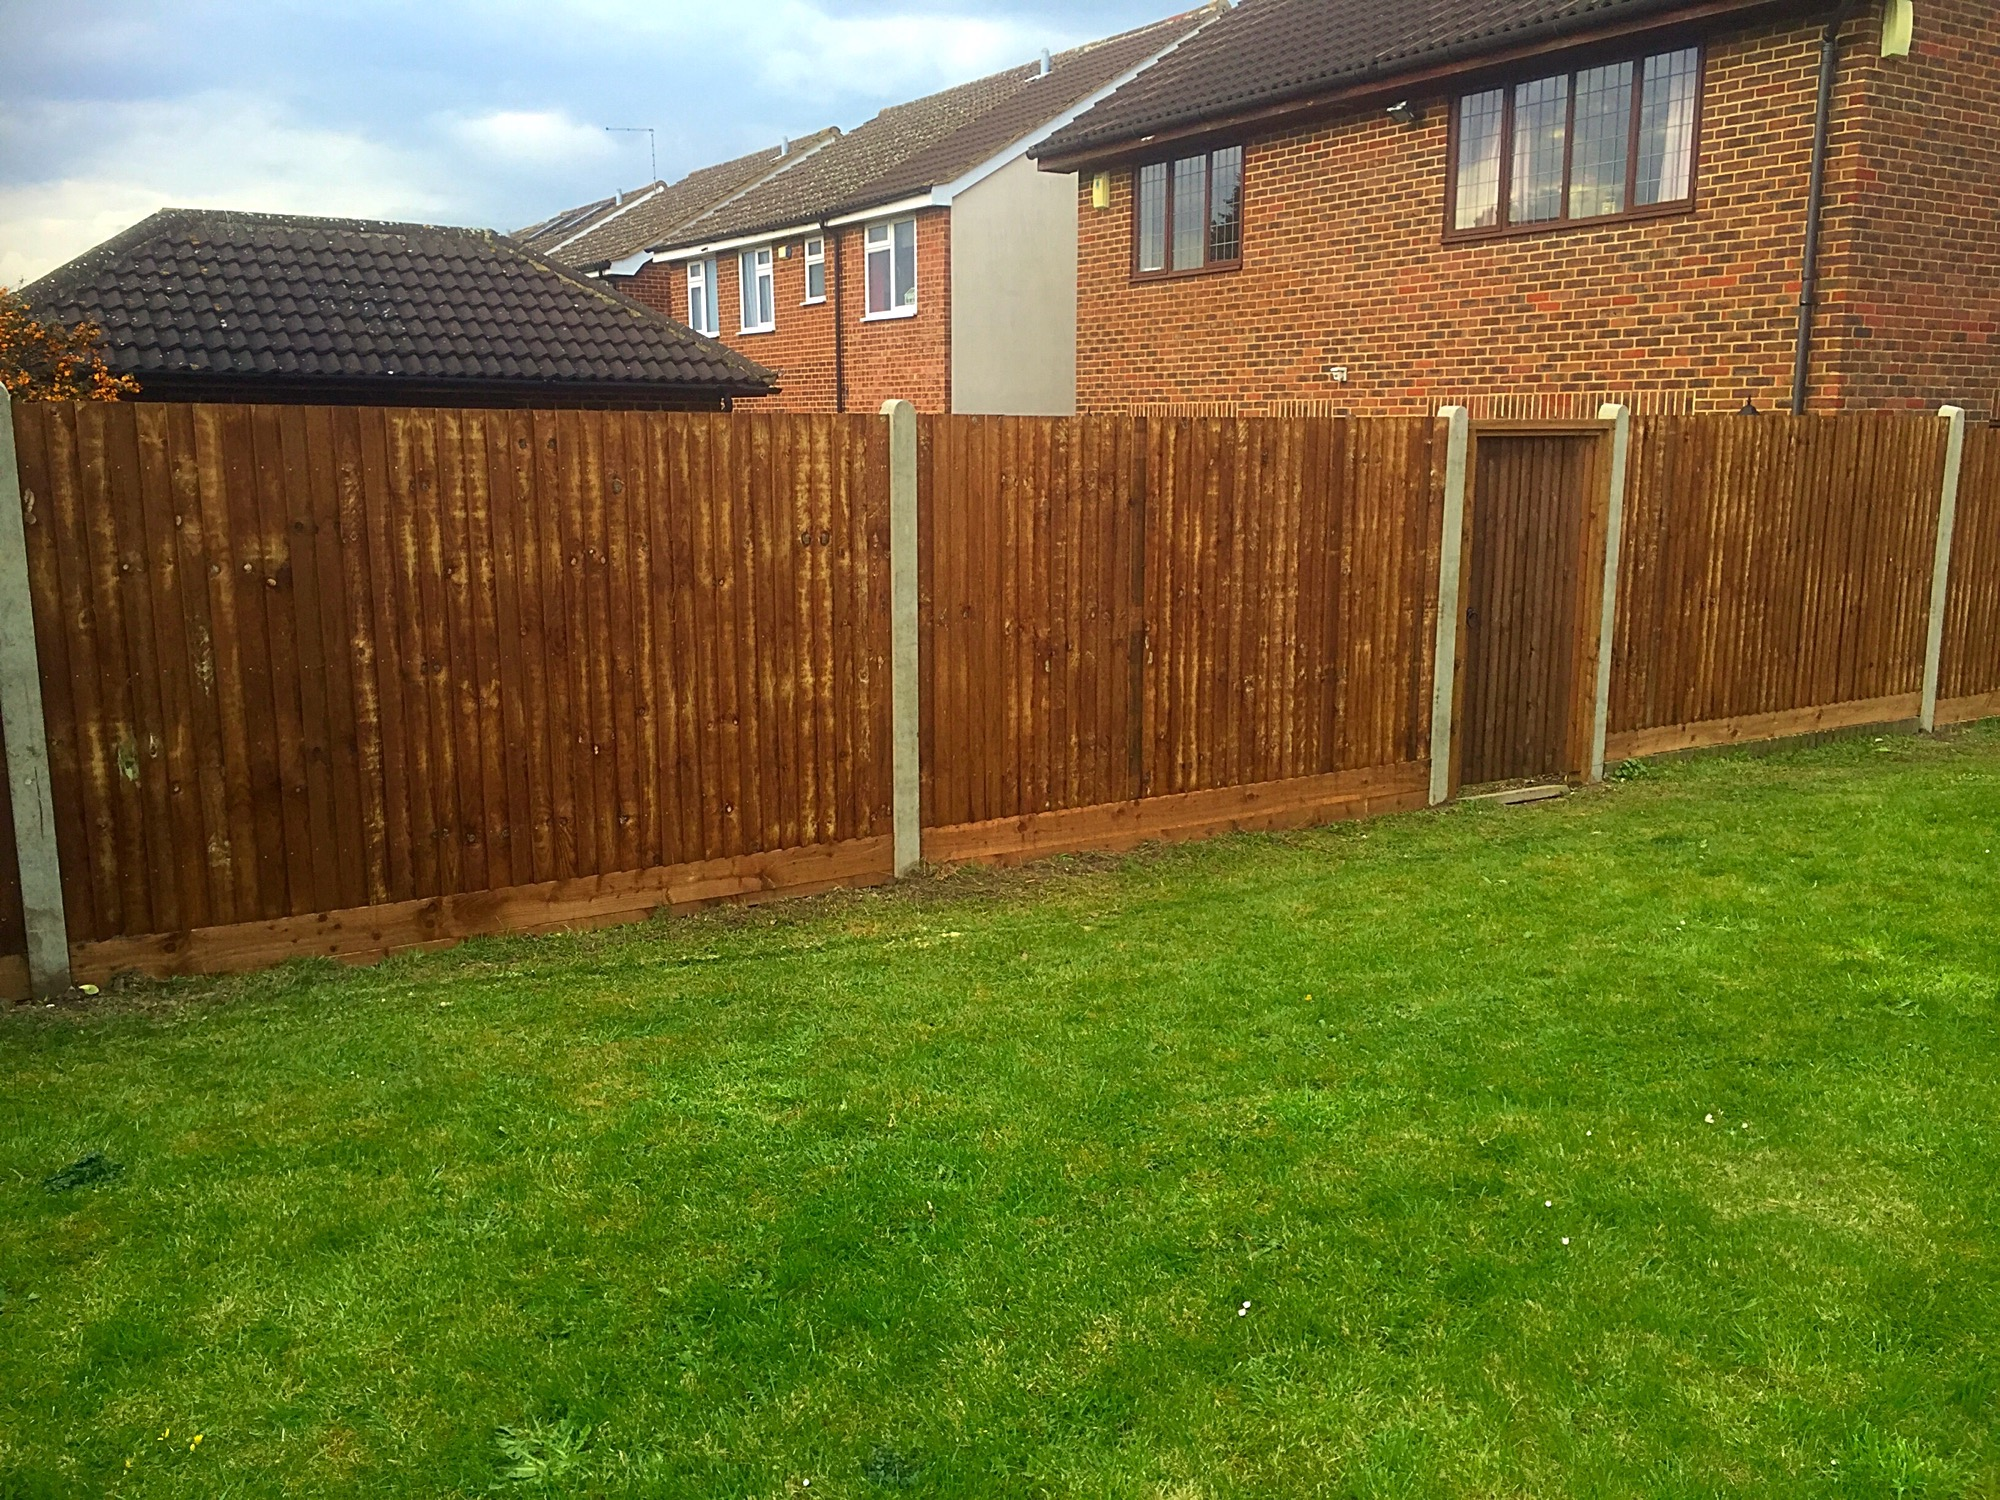 Garden Fence installers Bexleyheath.